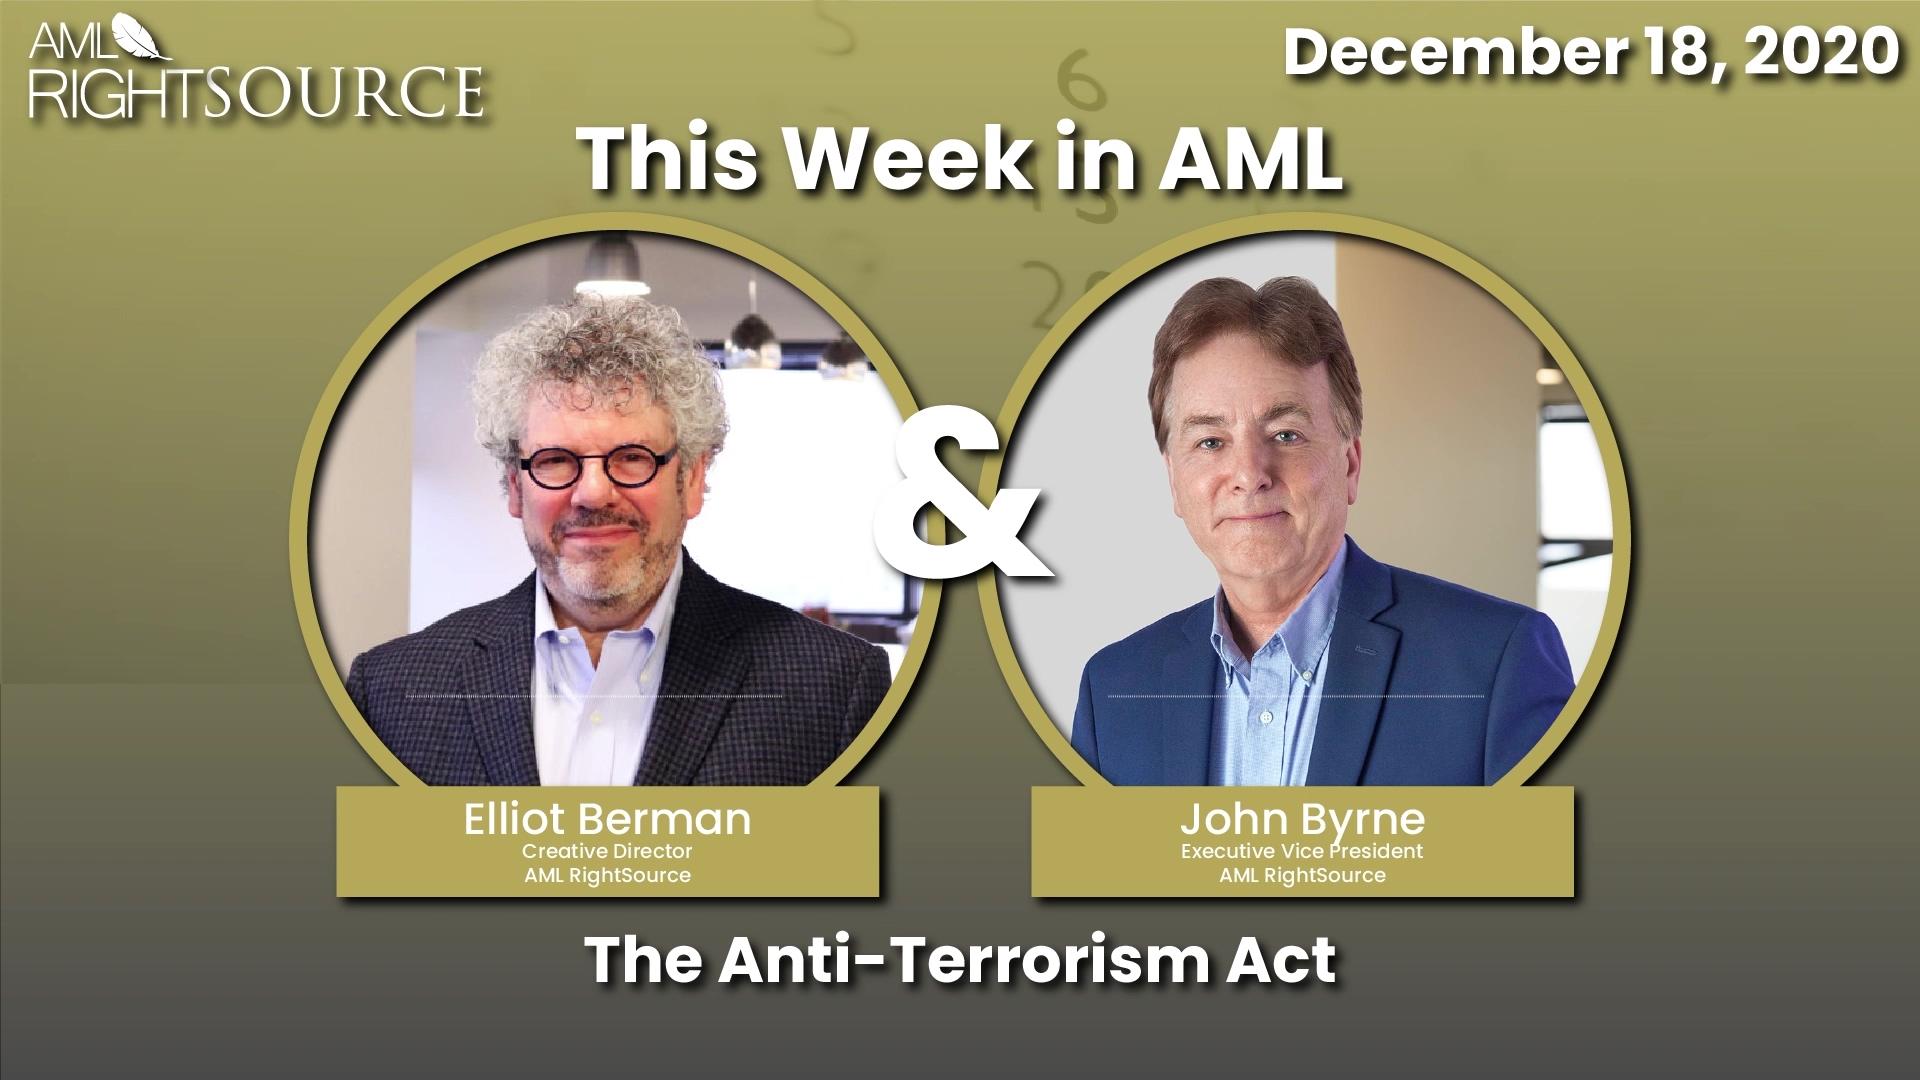 December 18 2020 - The Anti-Terrorism Act